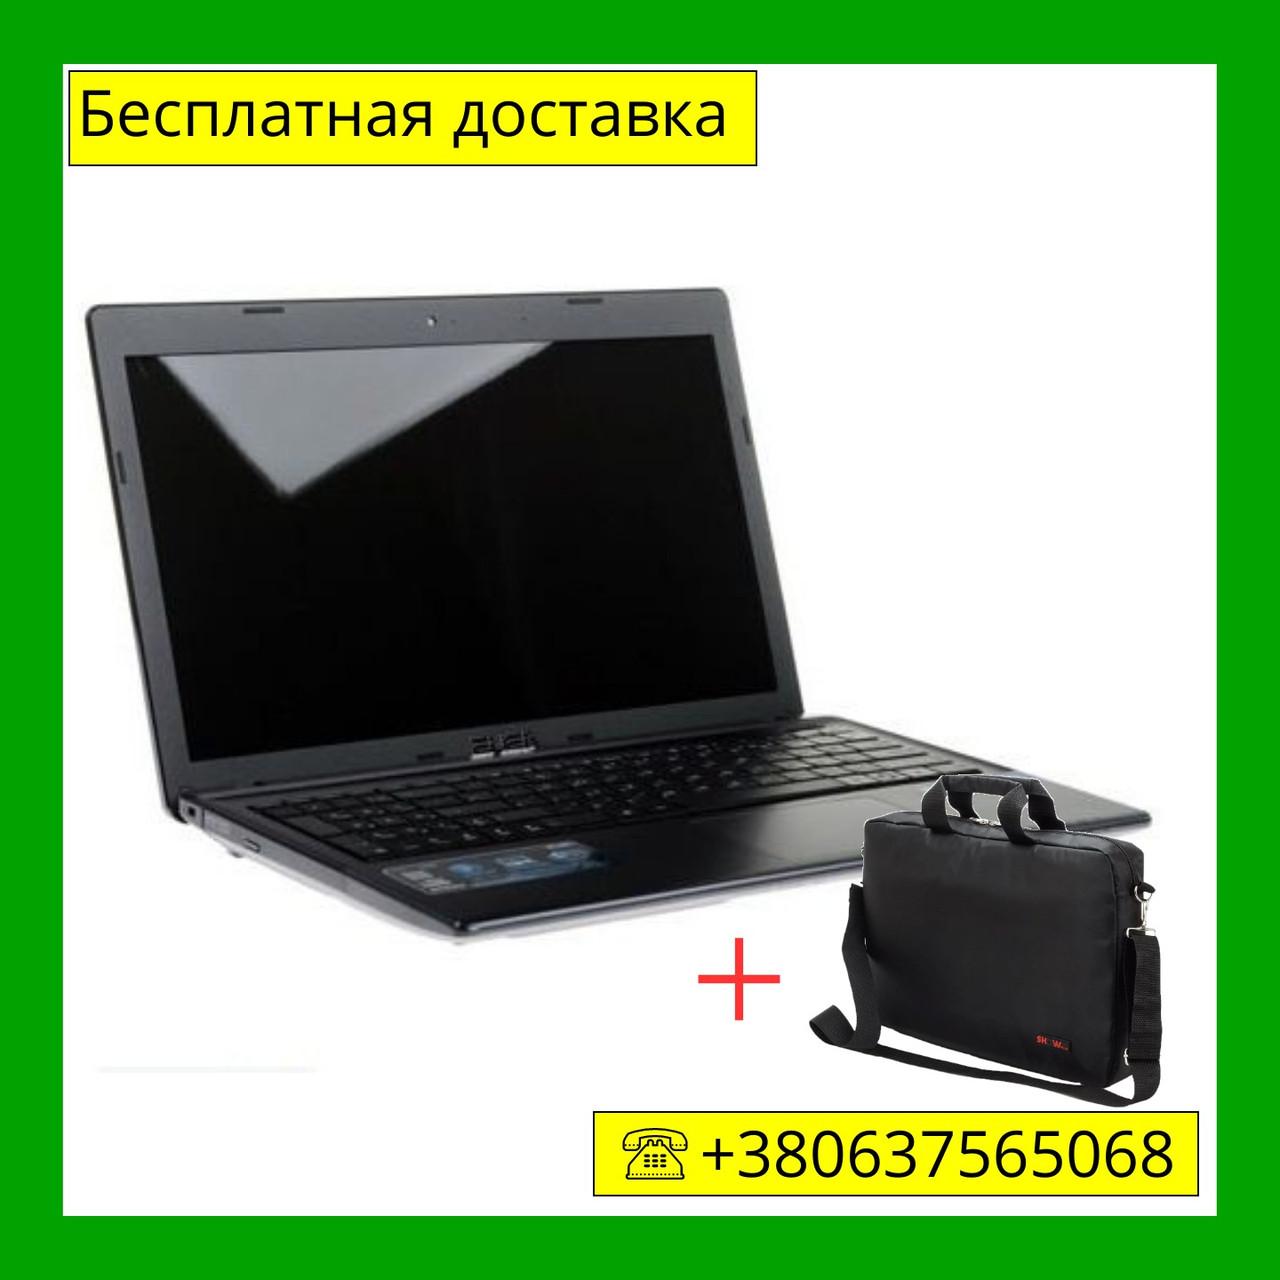 Б/У ноутбук Asus X55V  15,6 \ i3-2338M \ 4 GB \ 500 GB \ GeForce 610M \